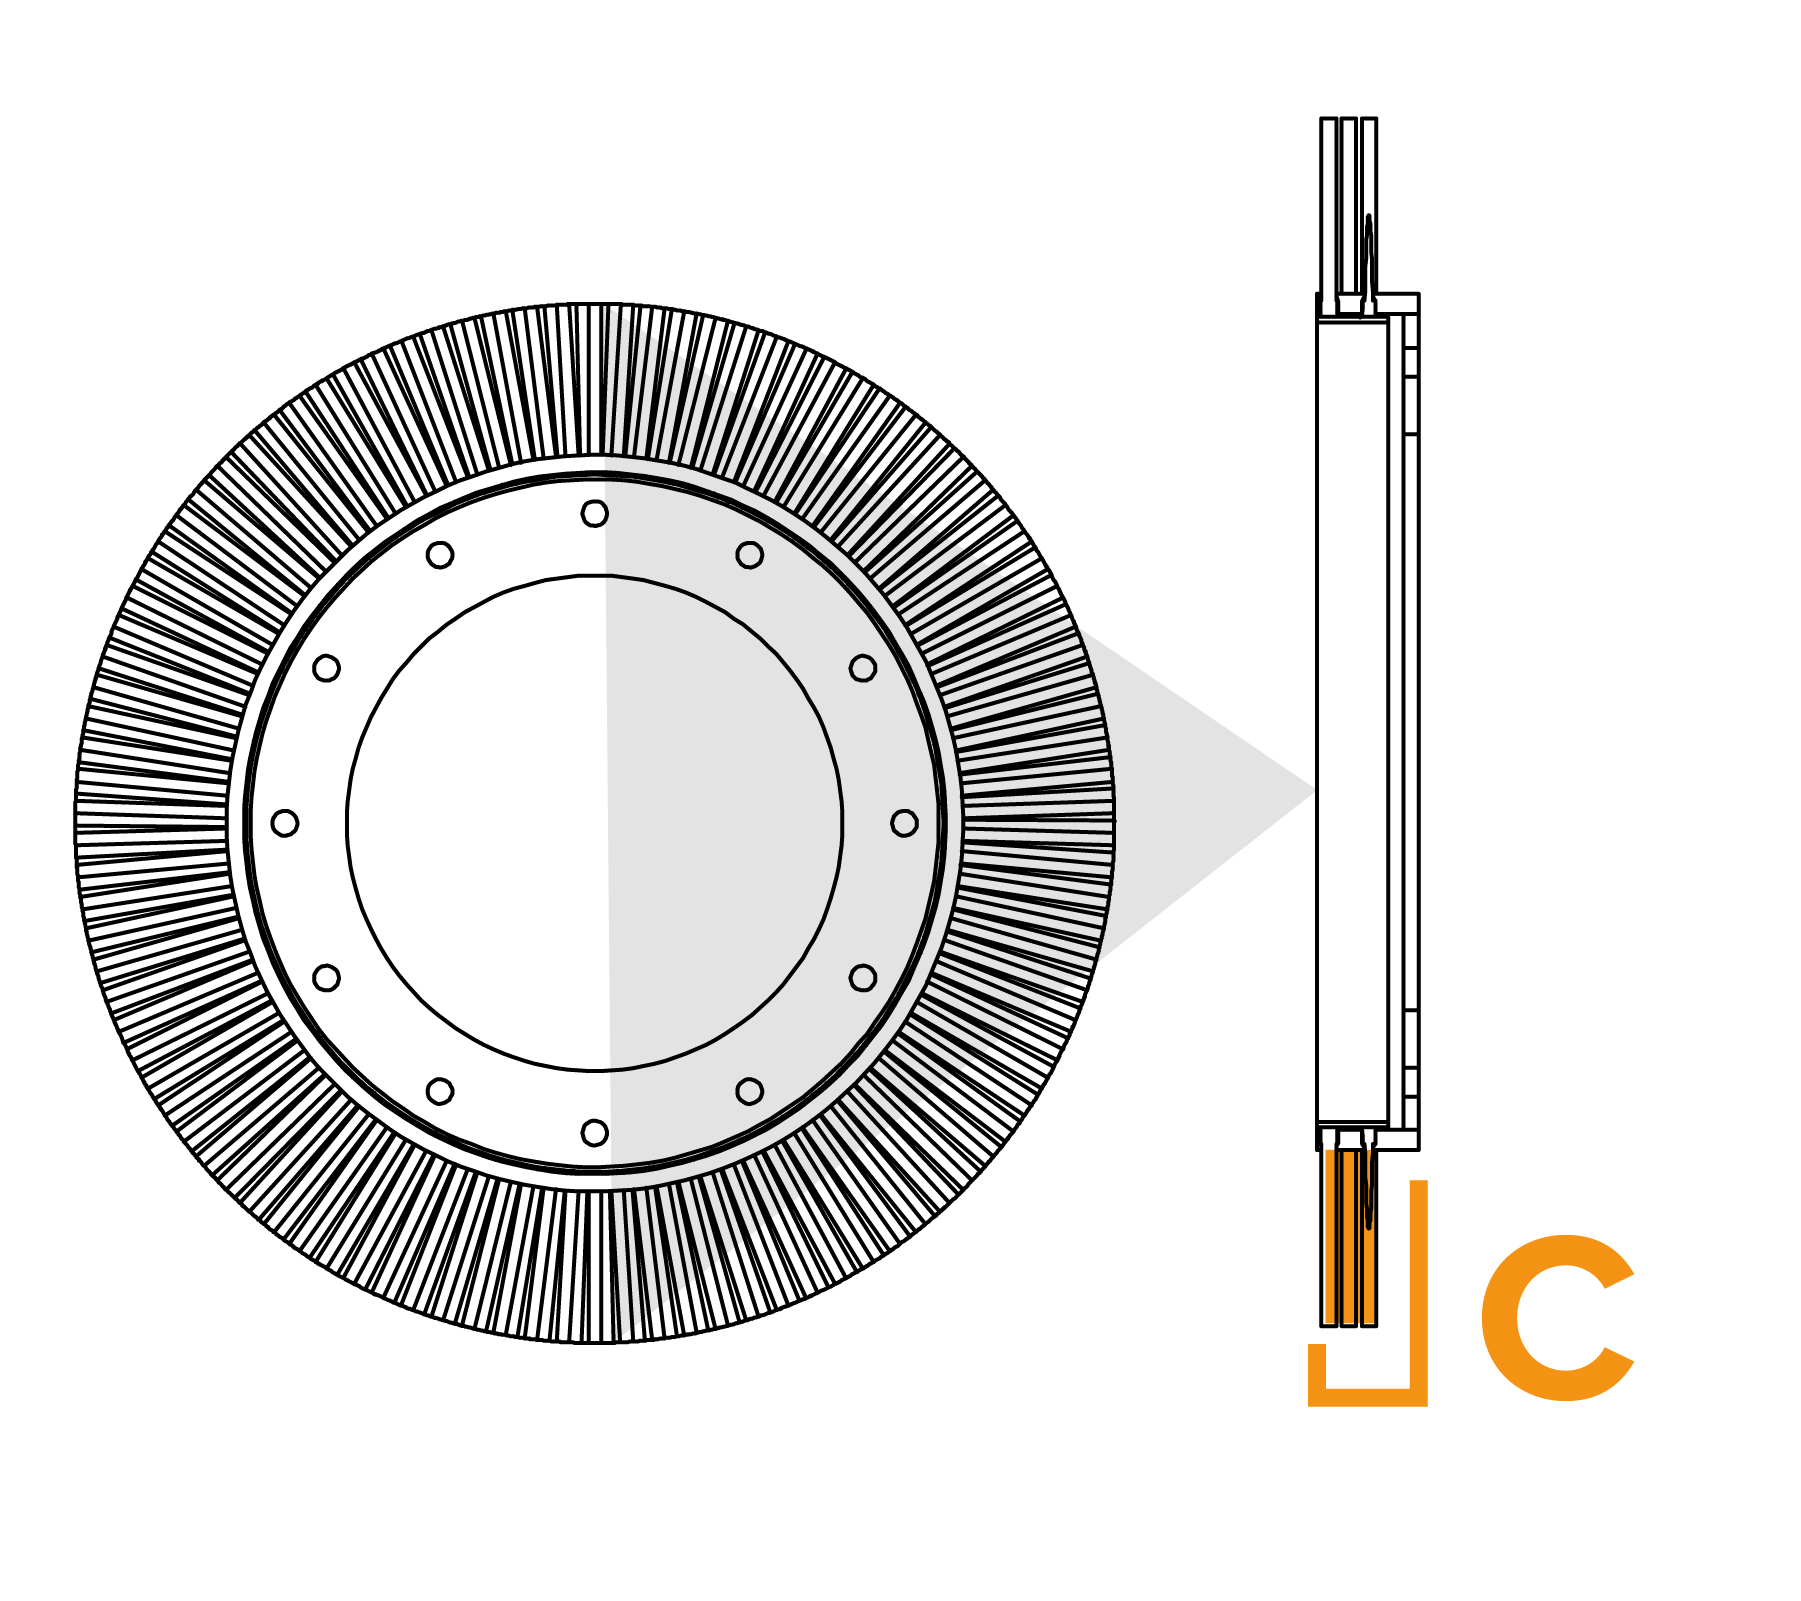 Potloodringborstel met grote diameter - diagram C